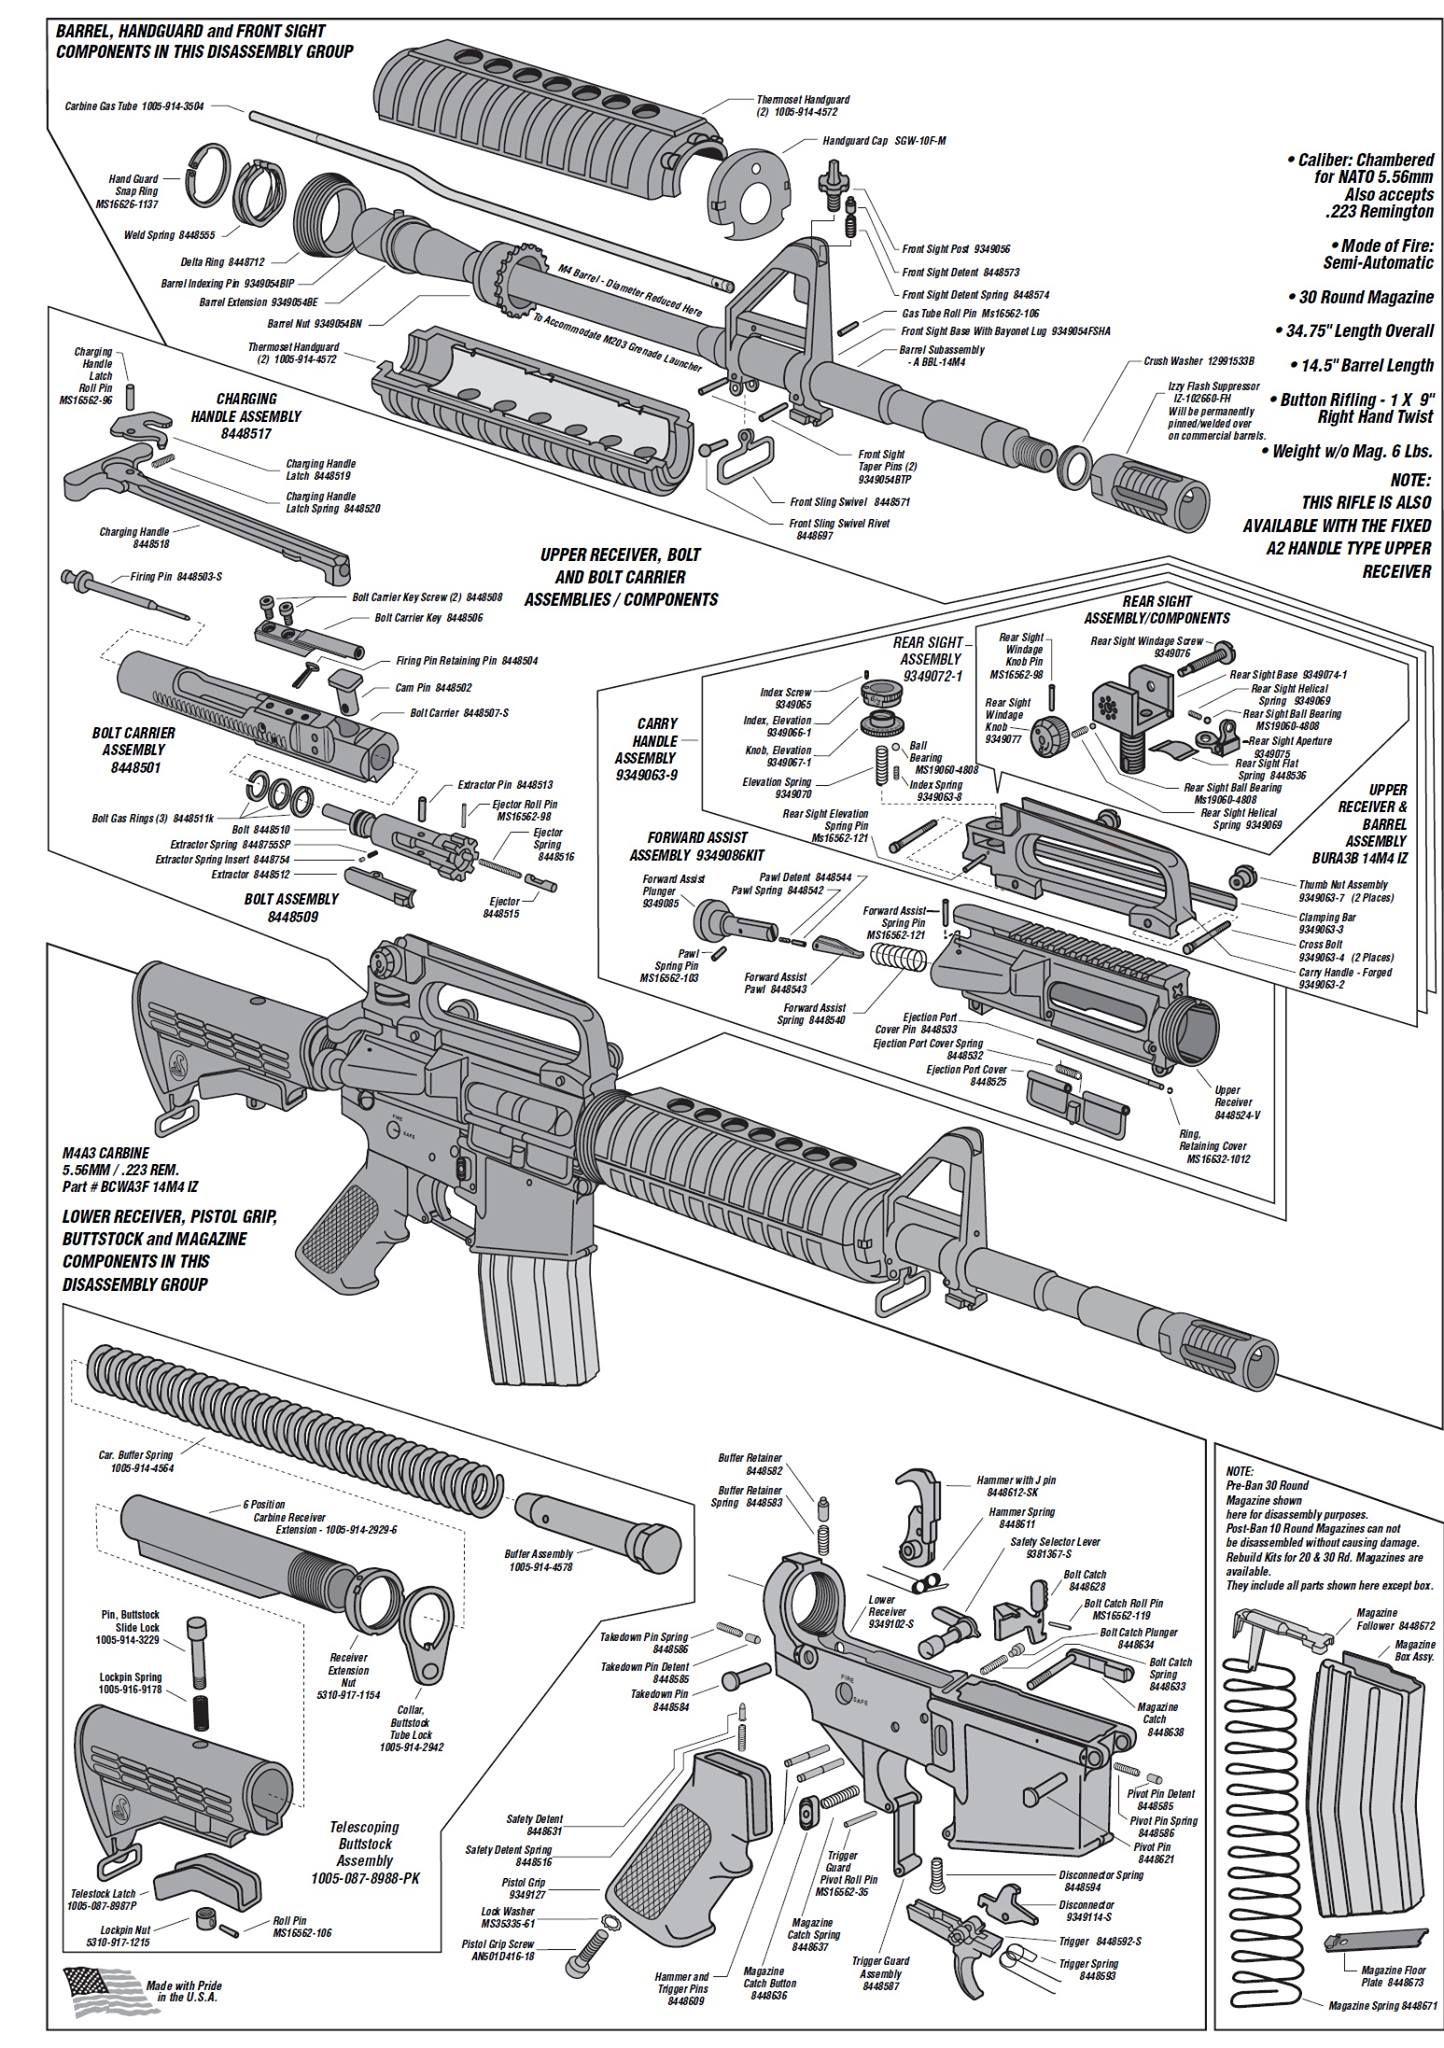 Parts Breakdown AR-15 | Tactical Rifles | Pinterest